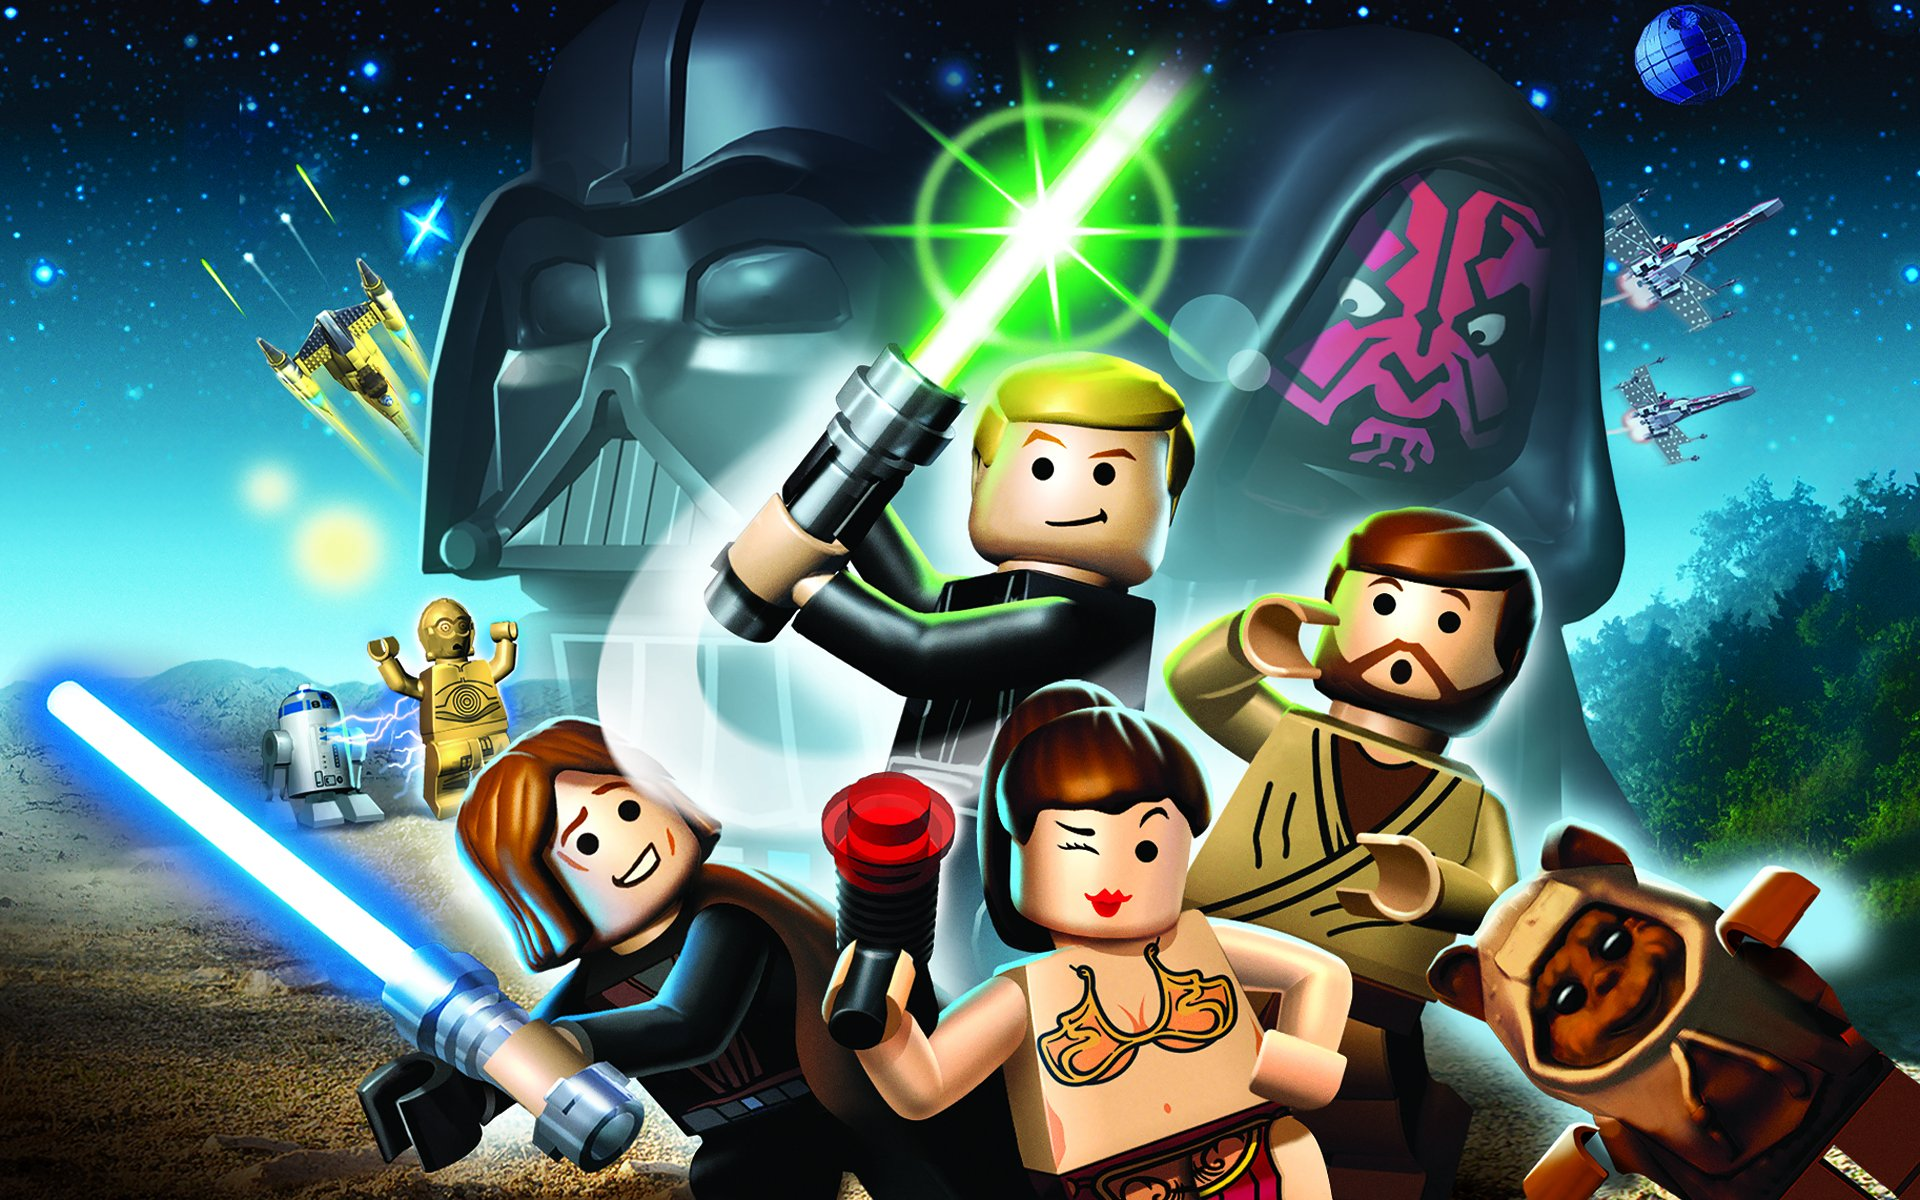 Lego star wars vs battles wiki fandom powered by wikia - Bd lego star wars ...